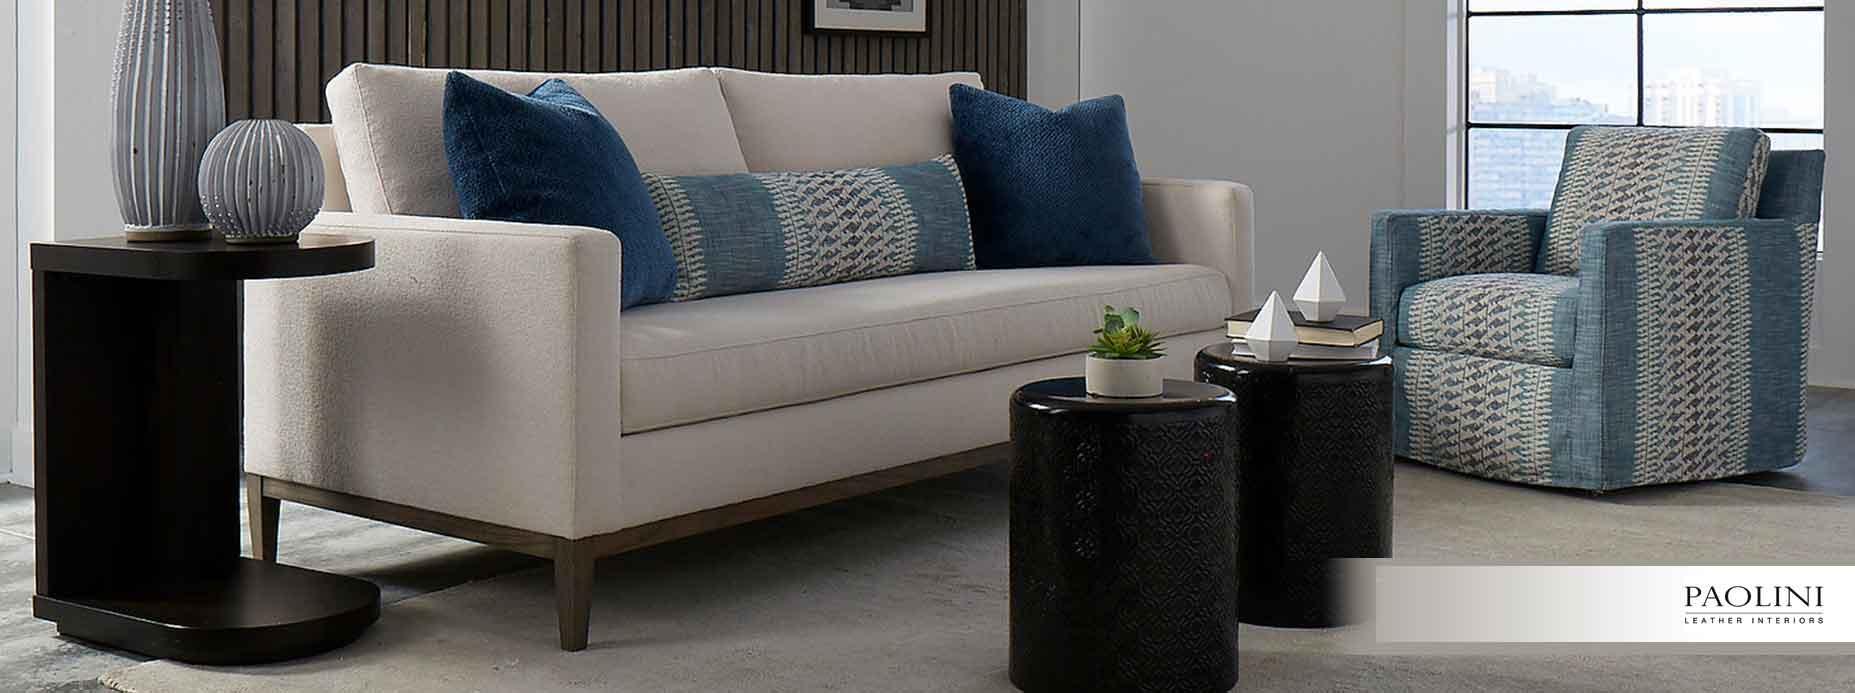 Timberwood Kate Sofa